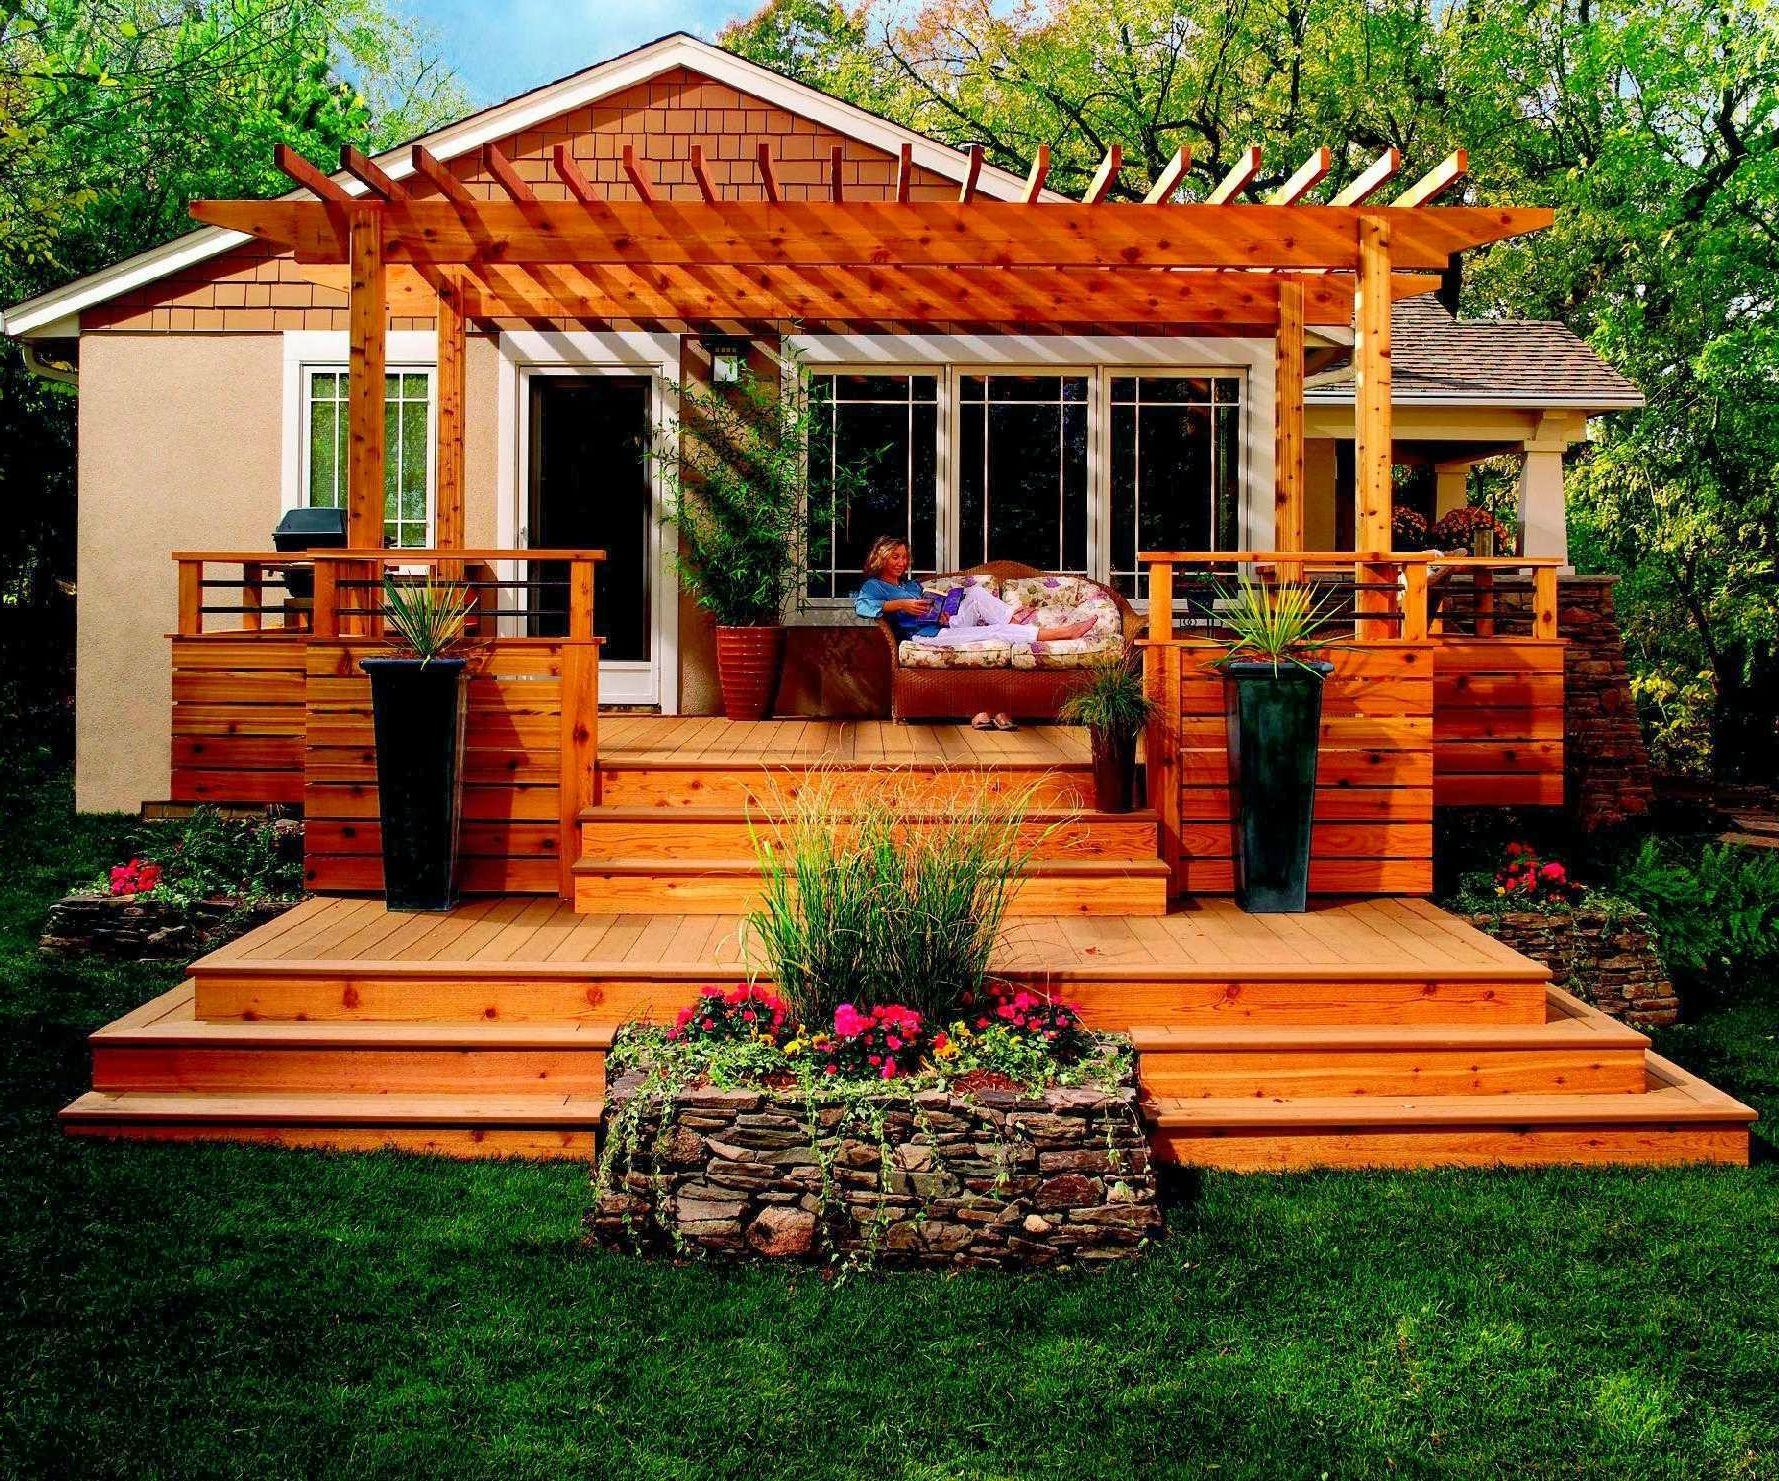 Pretty Backyard with Awesome Small Deck Idea